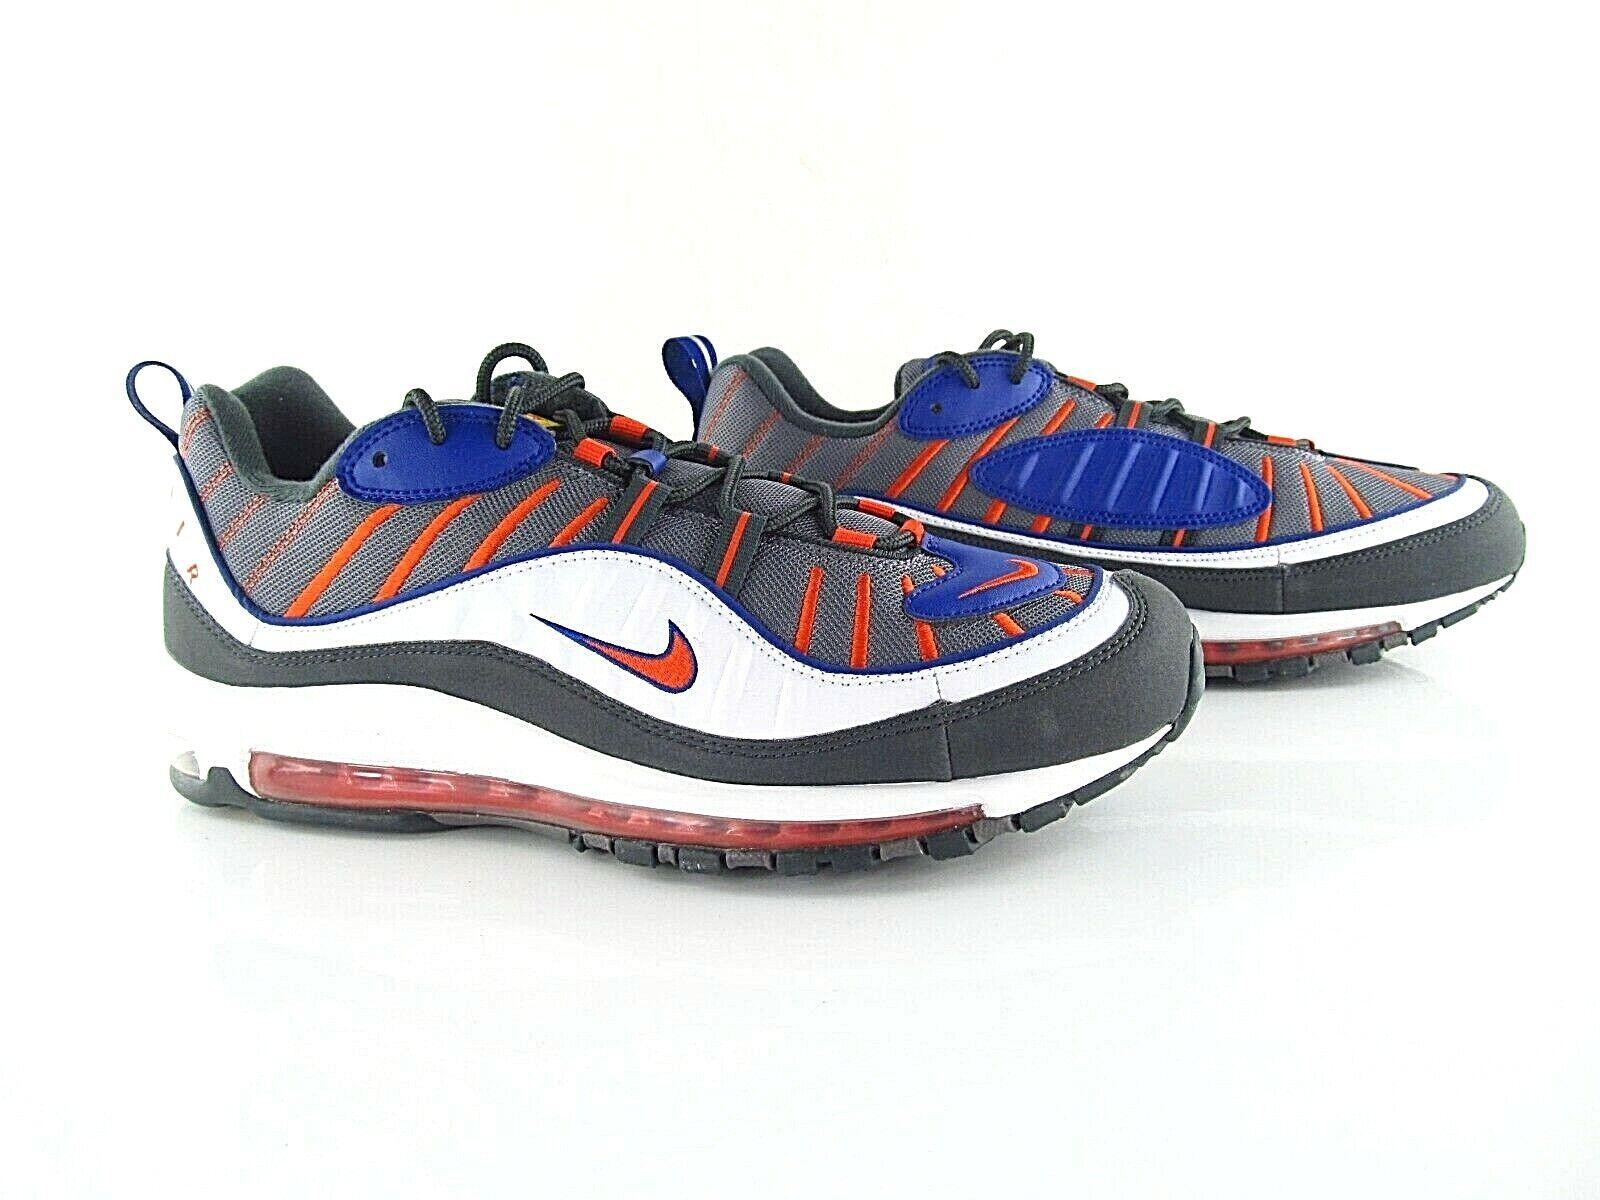 Nike Air Max 98 Blau Orange Grau New 640744 012 UK_11 US_12 Eur 46